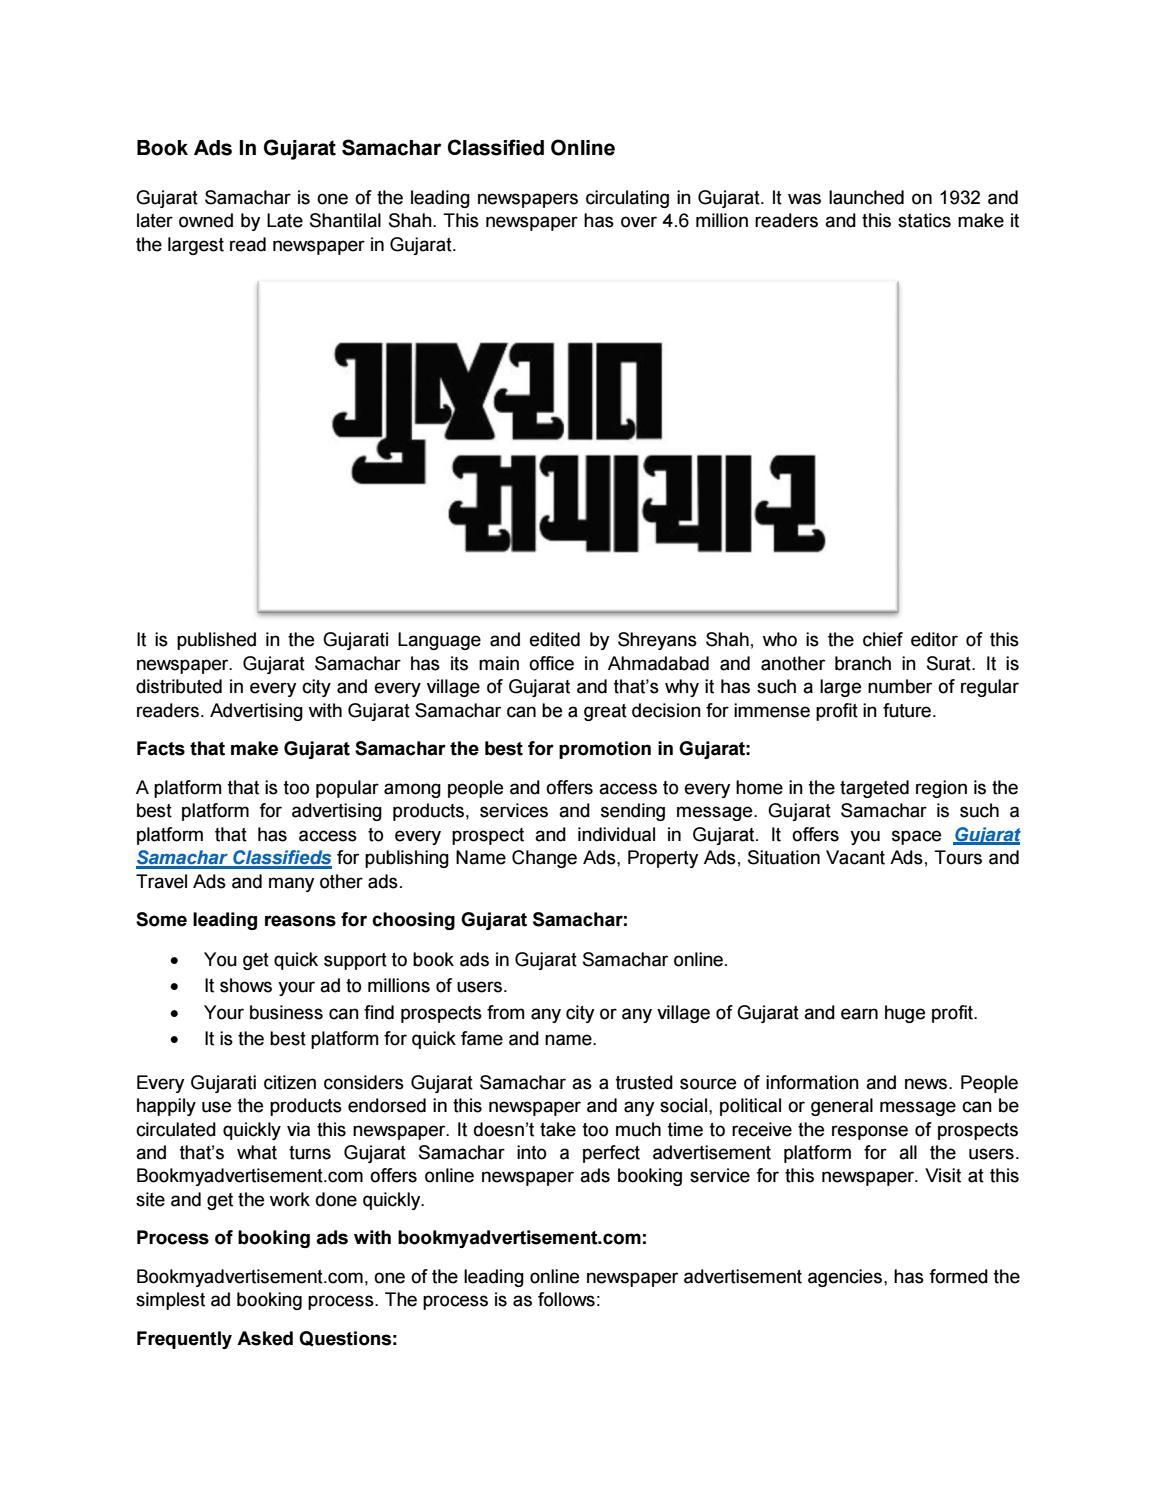 Book Ads In Gujarat Samachar Classified Online By Newspaper